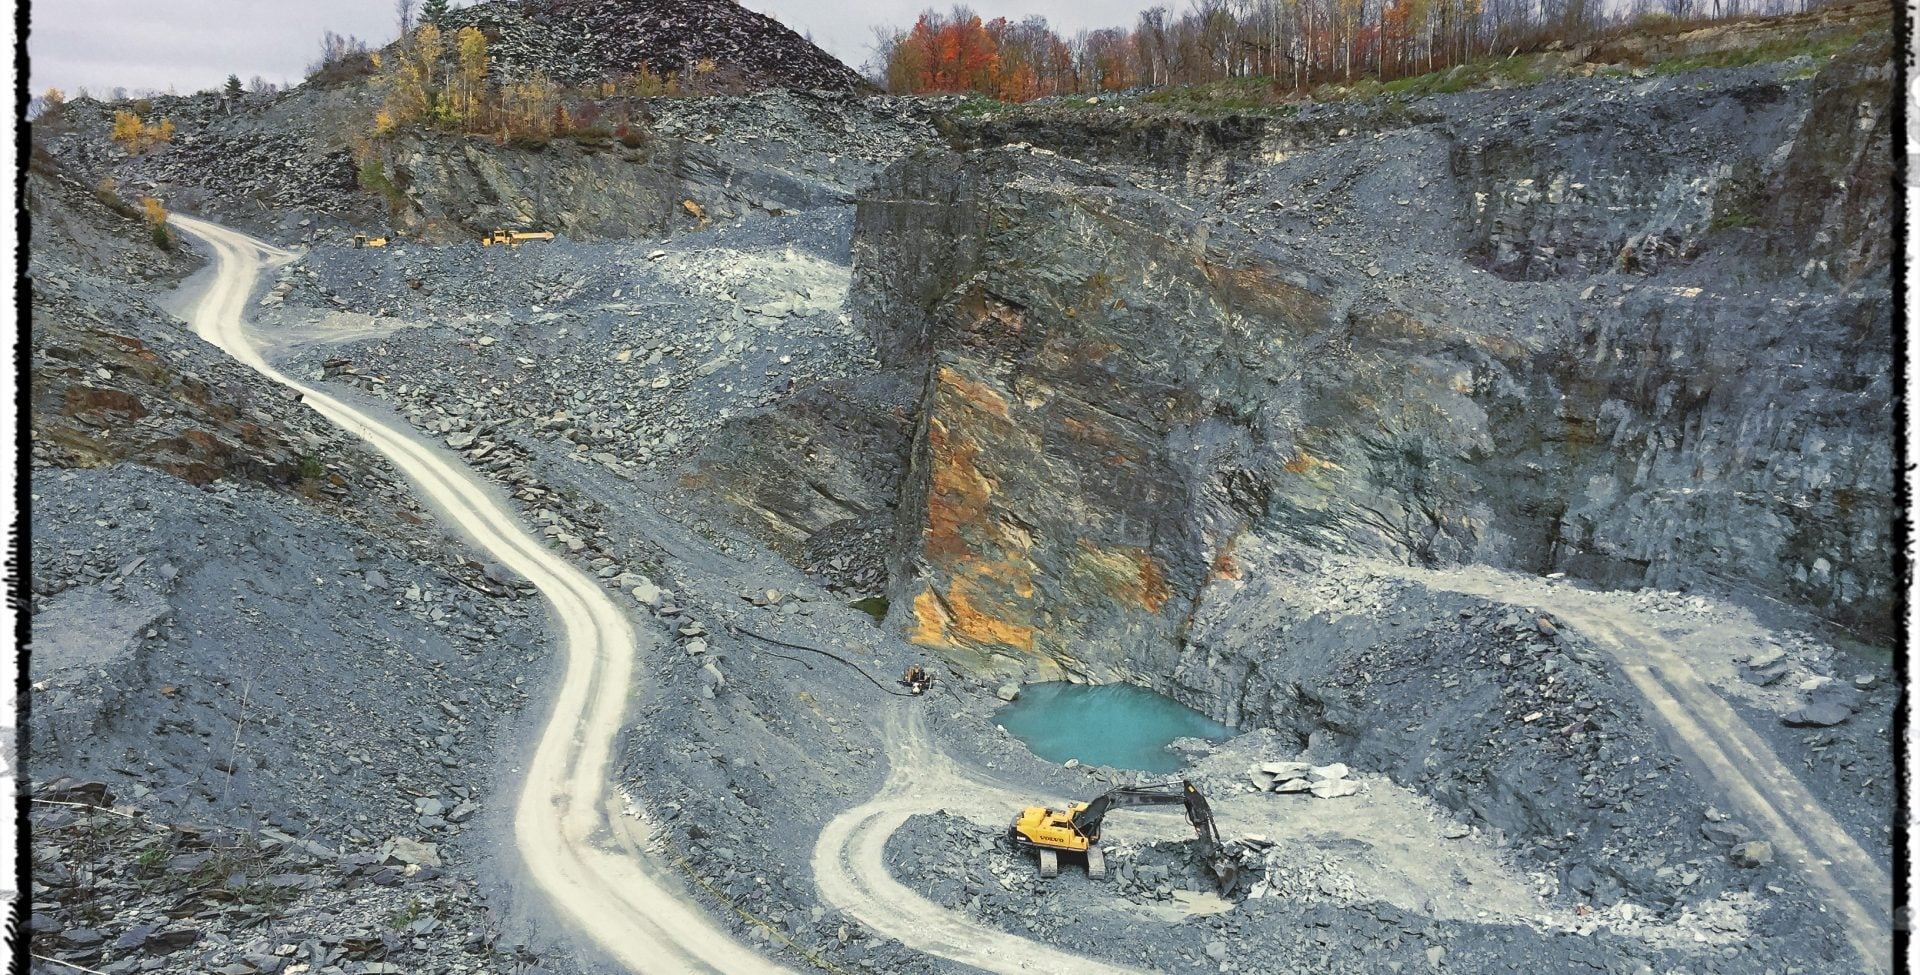 excavators cleaning up the quarry